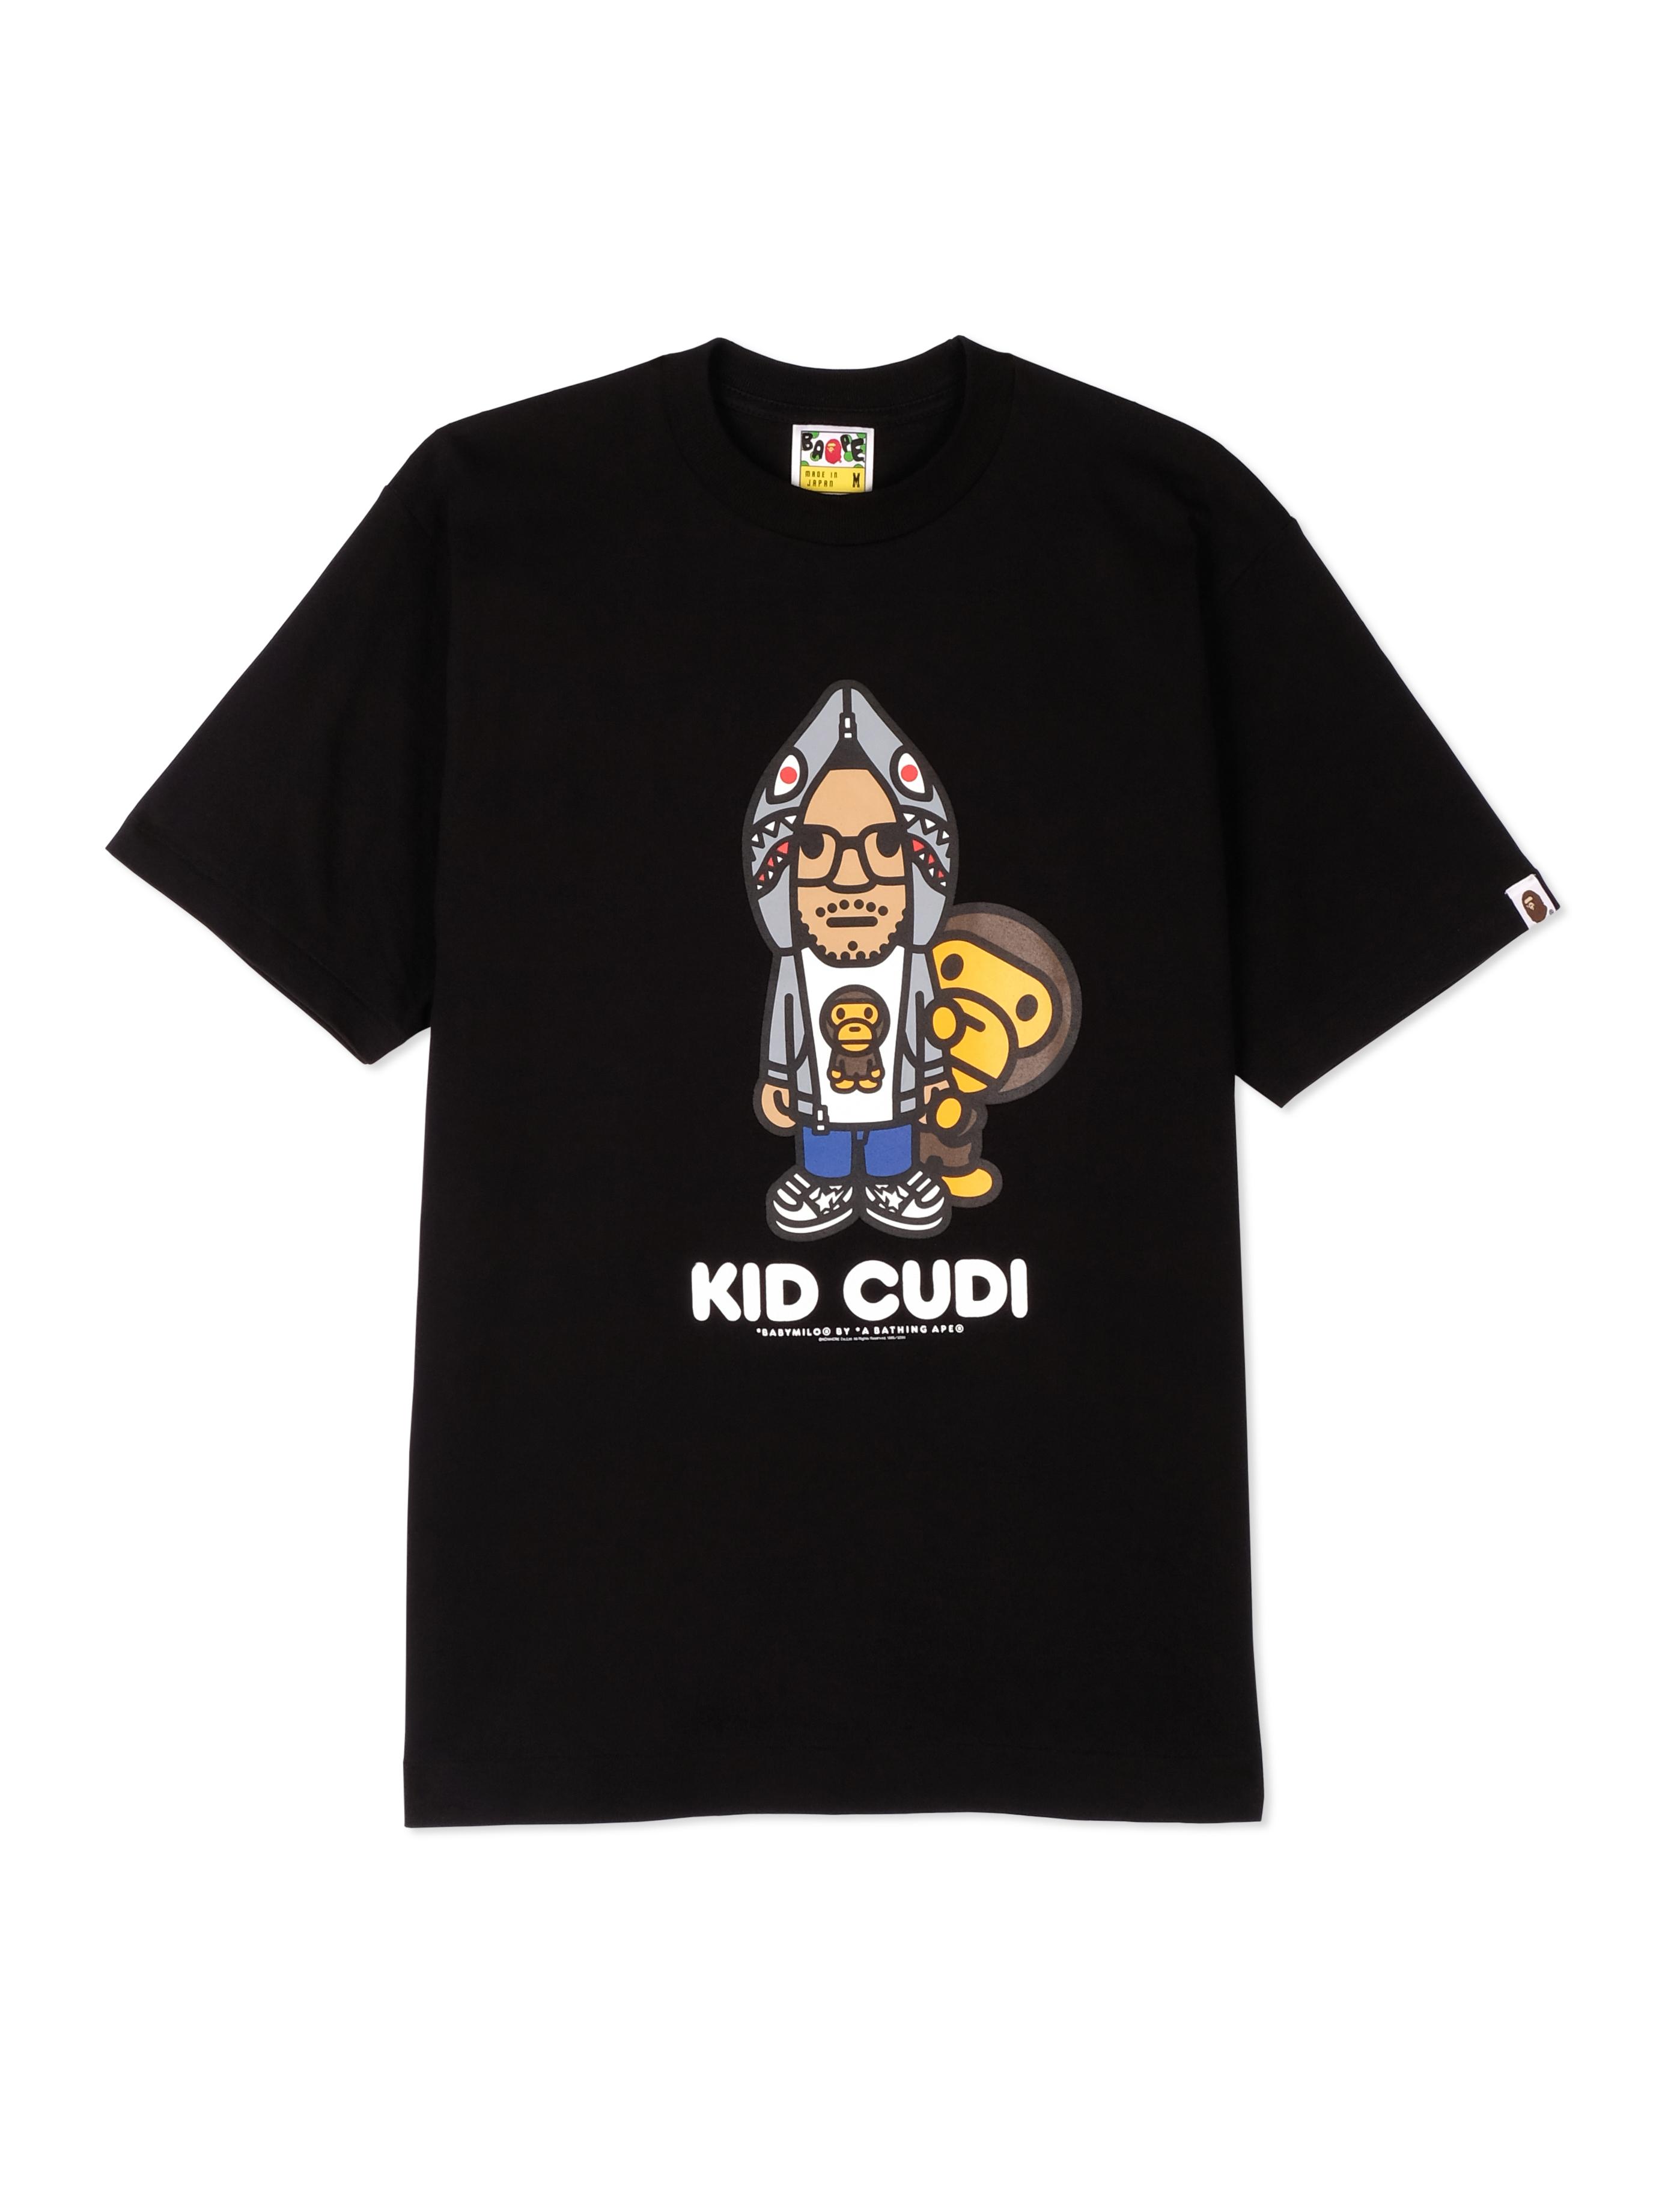 d54b3ae6b Bape × Kid Cudi ×. Kid Cudi Baby Milo Tee